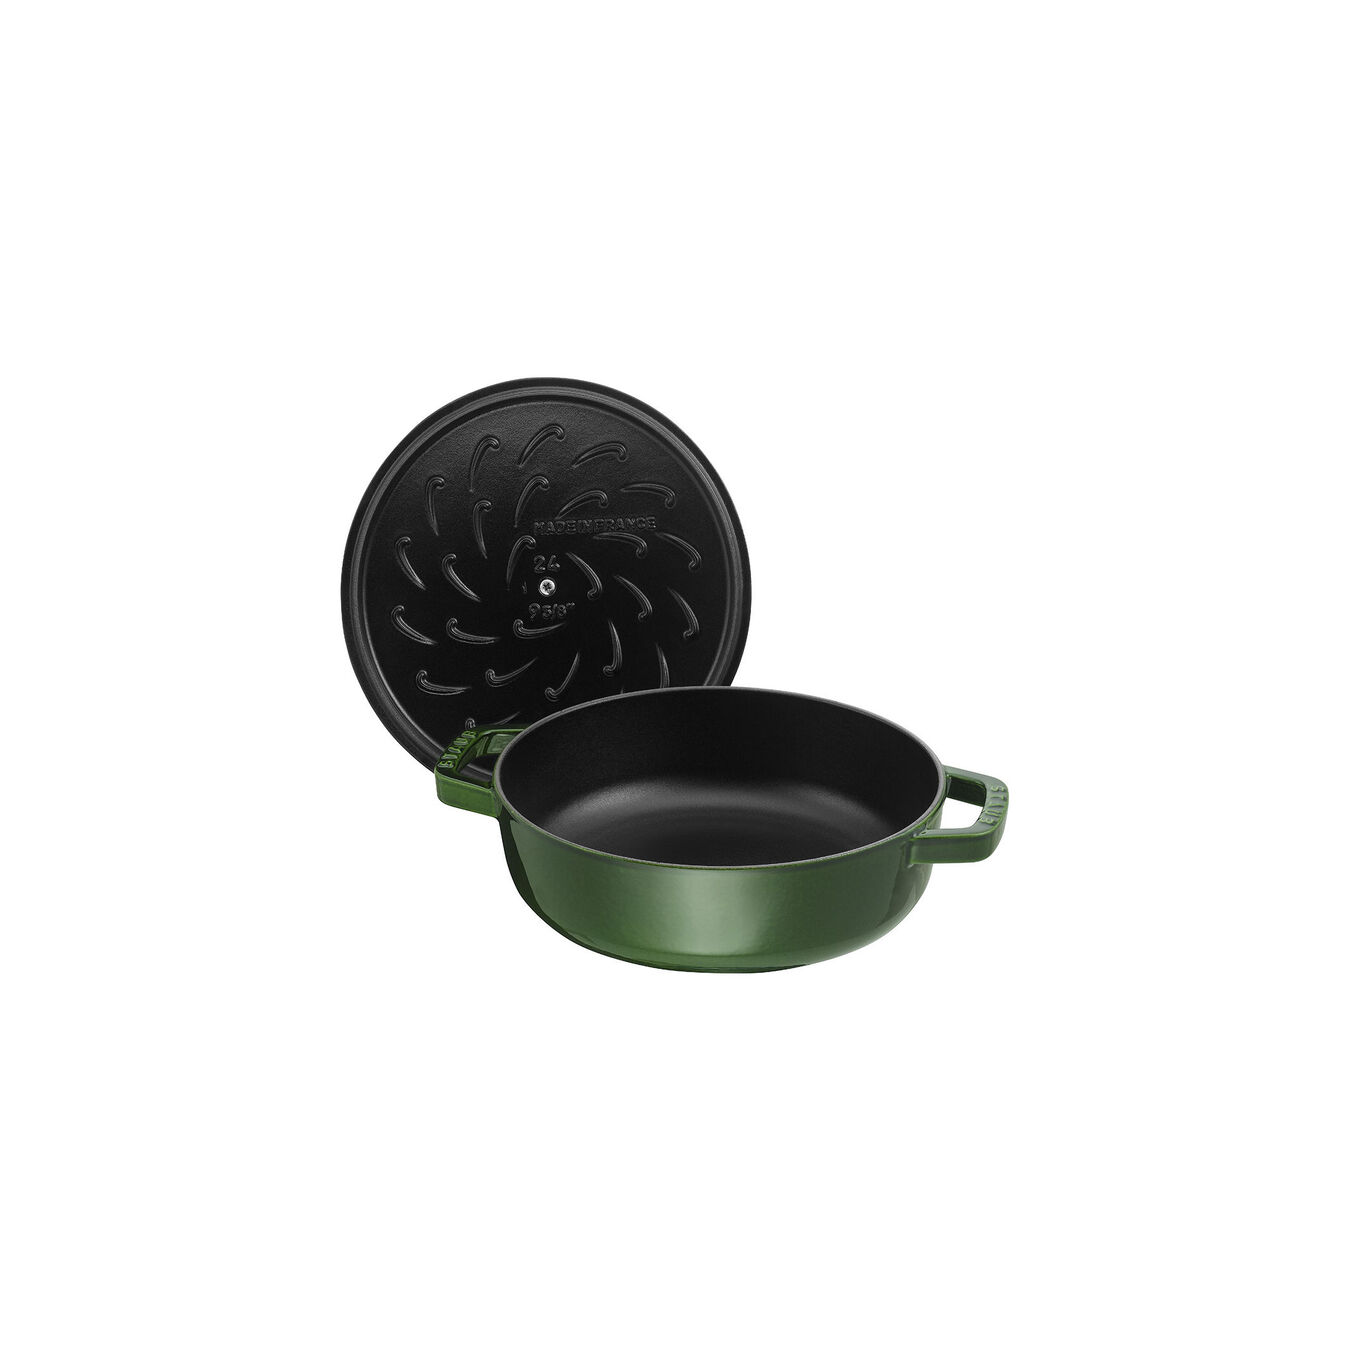 3.75 l Cast iron round Saute pan Chistera, Basil-Green,,large 2